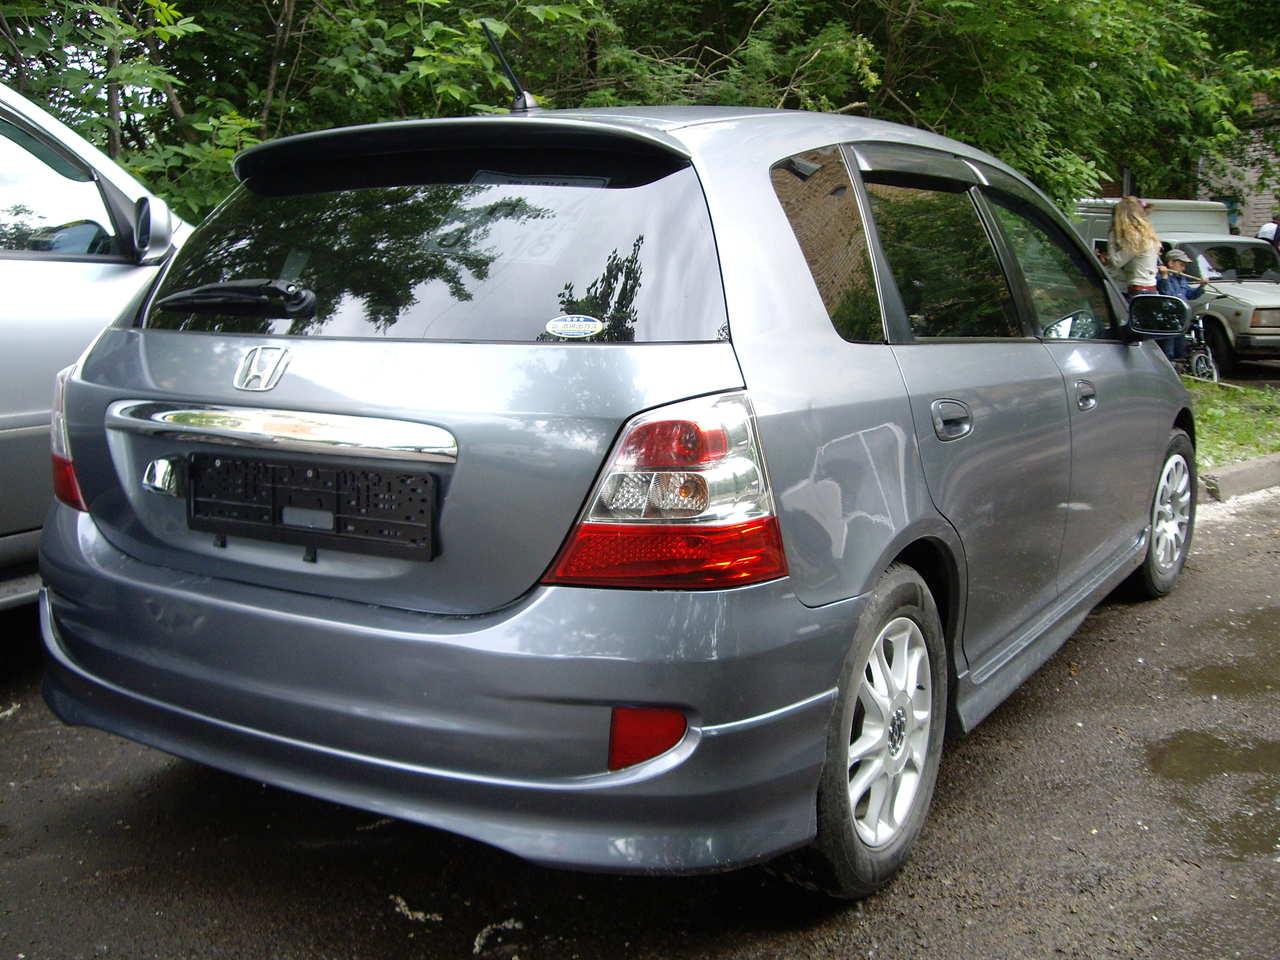 2004 honda civic pictures gasoline ff cvt for sale for Honda civic overheating